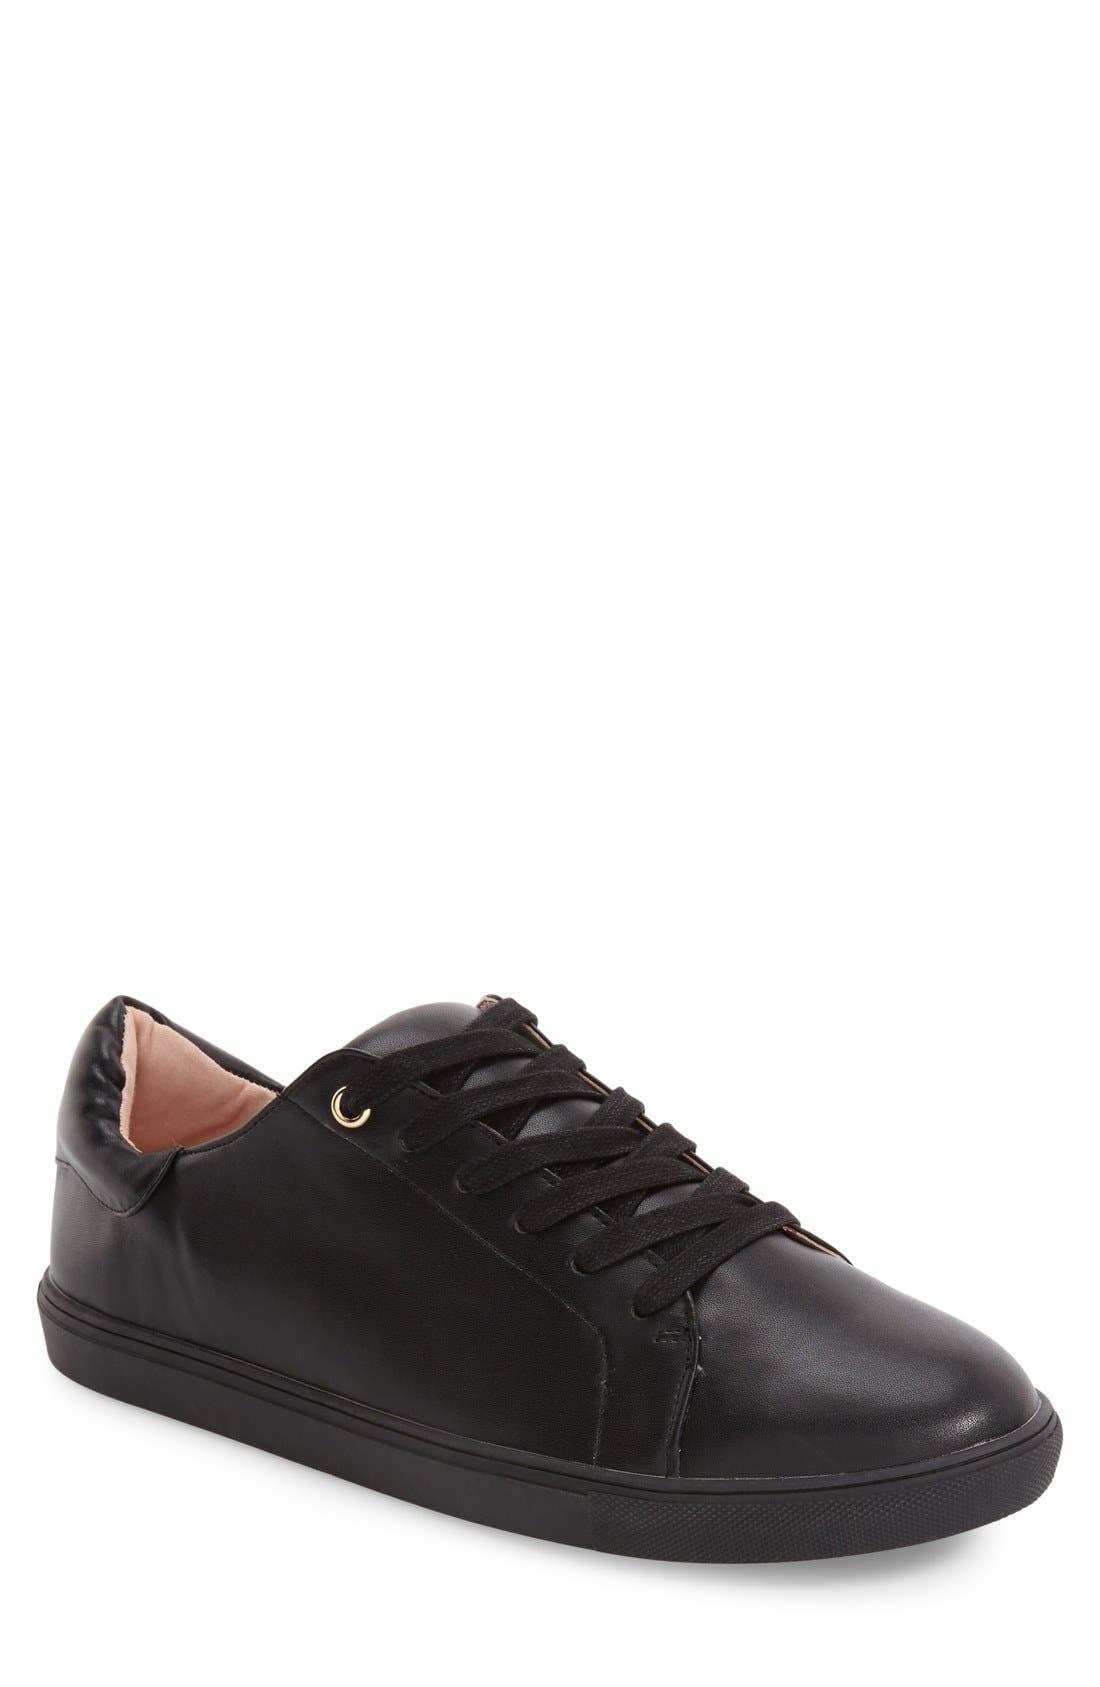 Catseye Sneaker,                         Main,                         color, 001